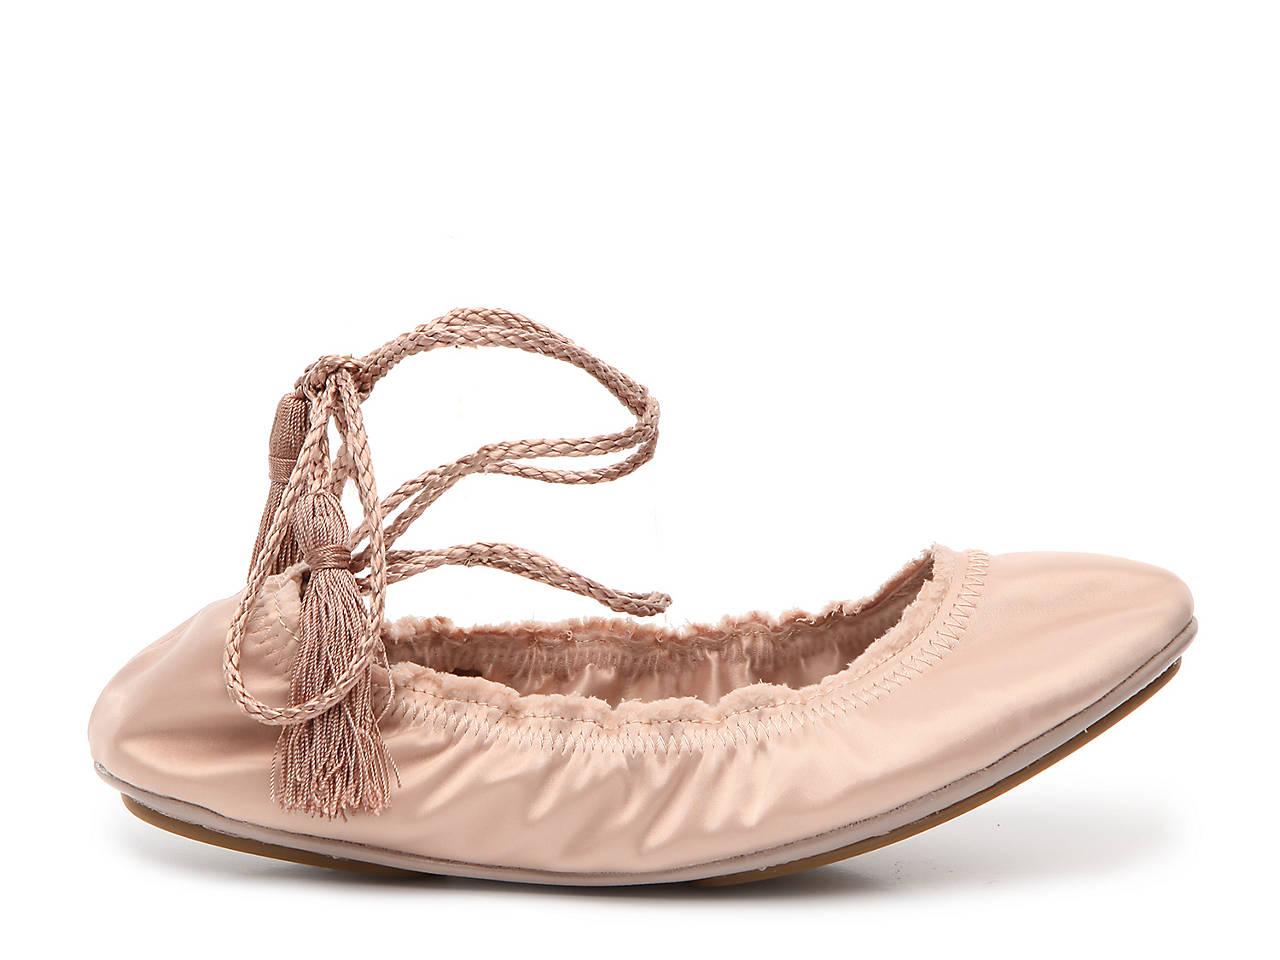 dadccd72e Joie Bandele Ballet Flat Women's Shoes   DSW